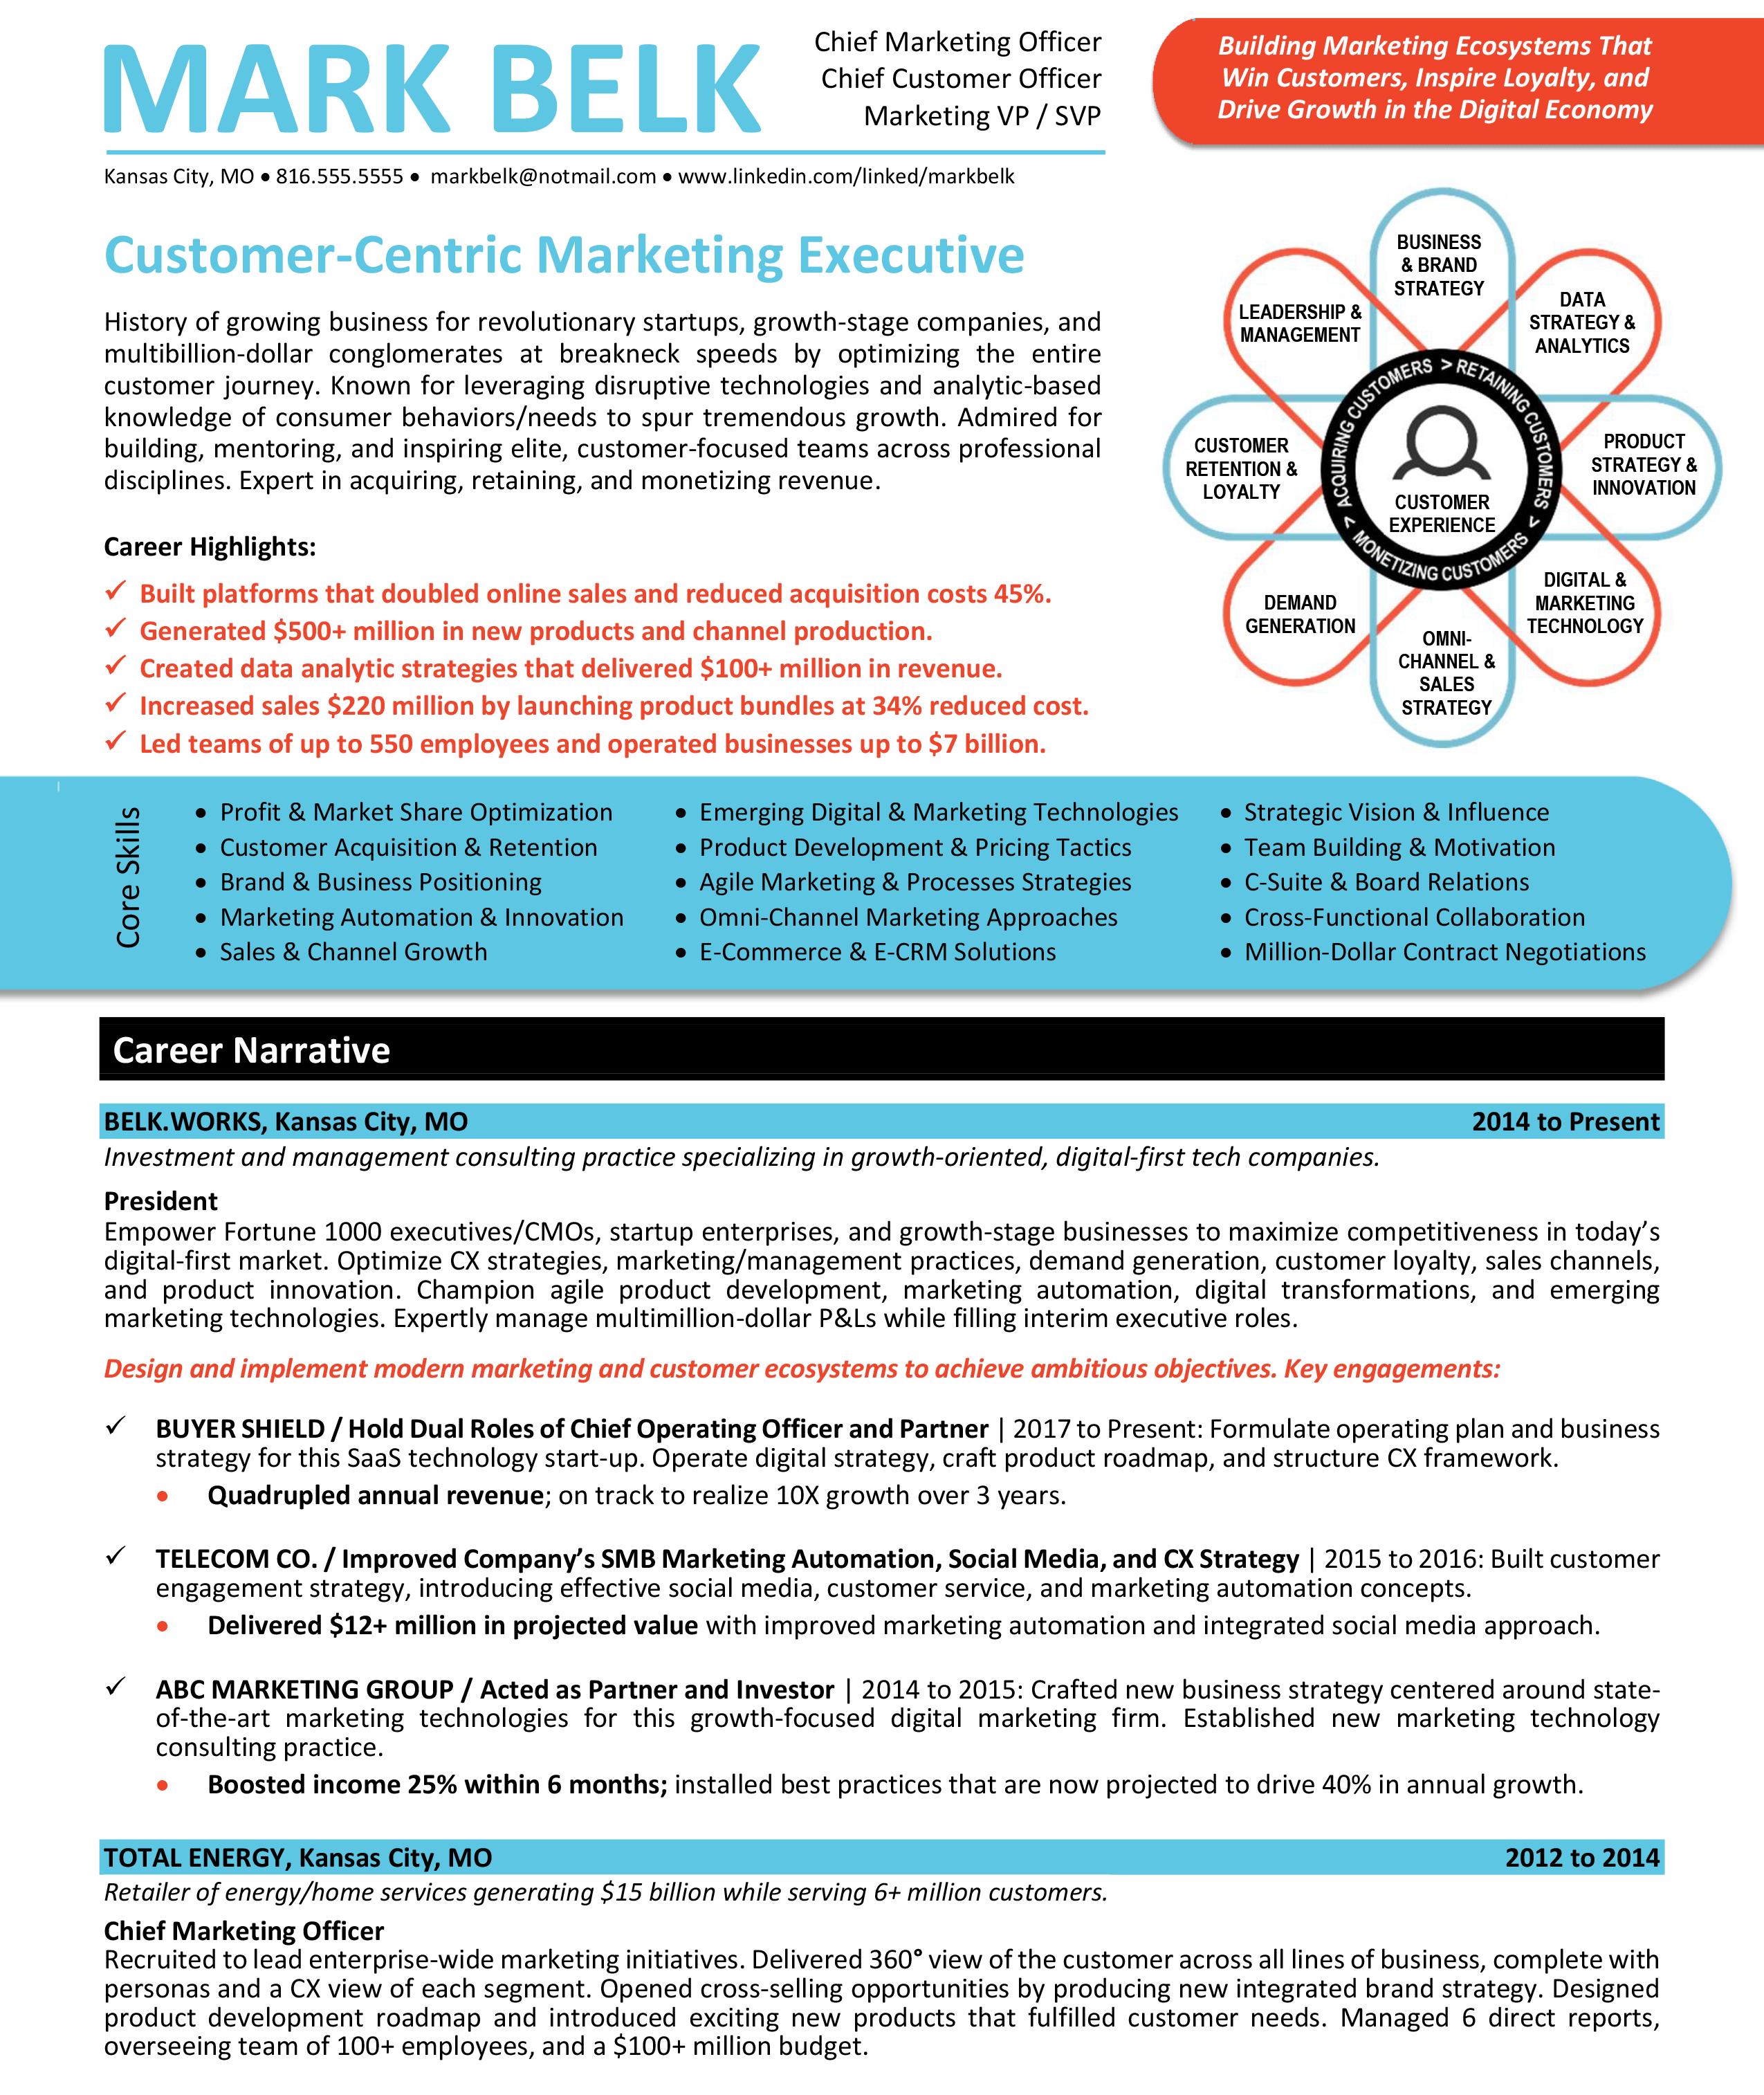 Chief Marketing Officer Cmo Chief Customer Officer Cco Resume Sample Chief Marketing Officer Marketing Resume Executive Resume